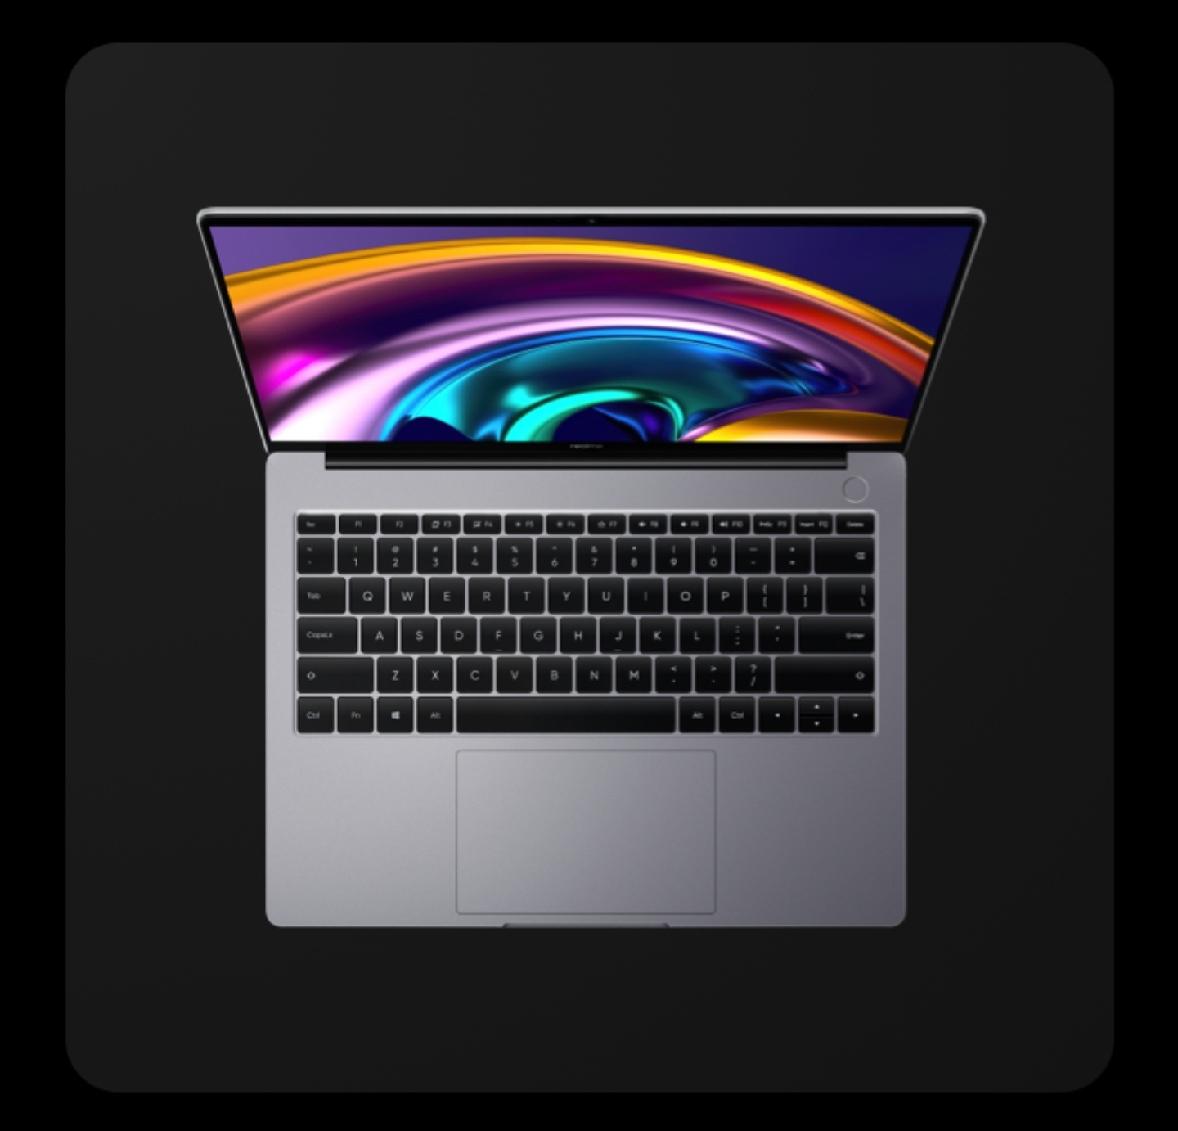 laptop-realme-book-2021-brand-new